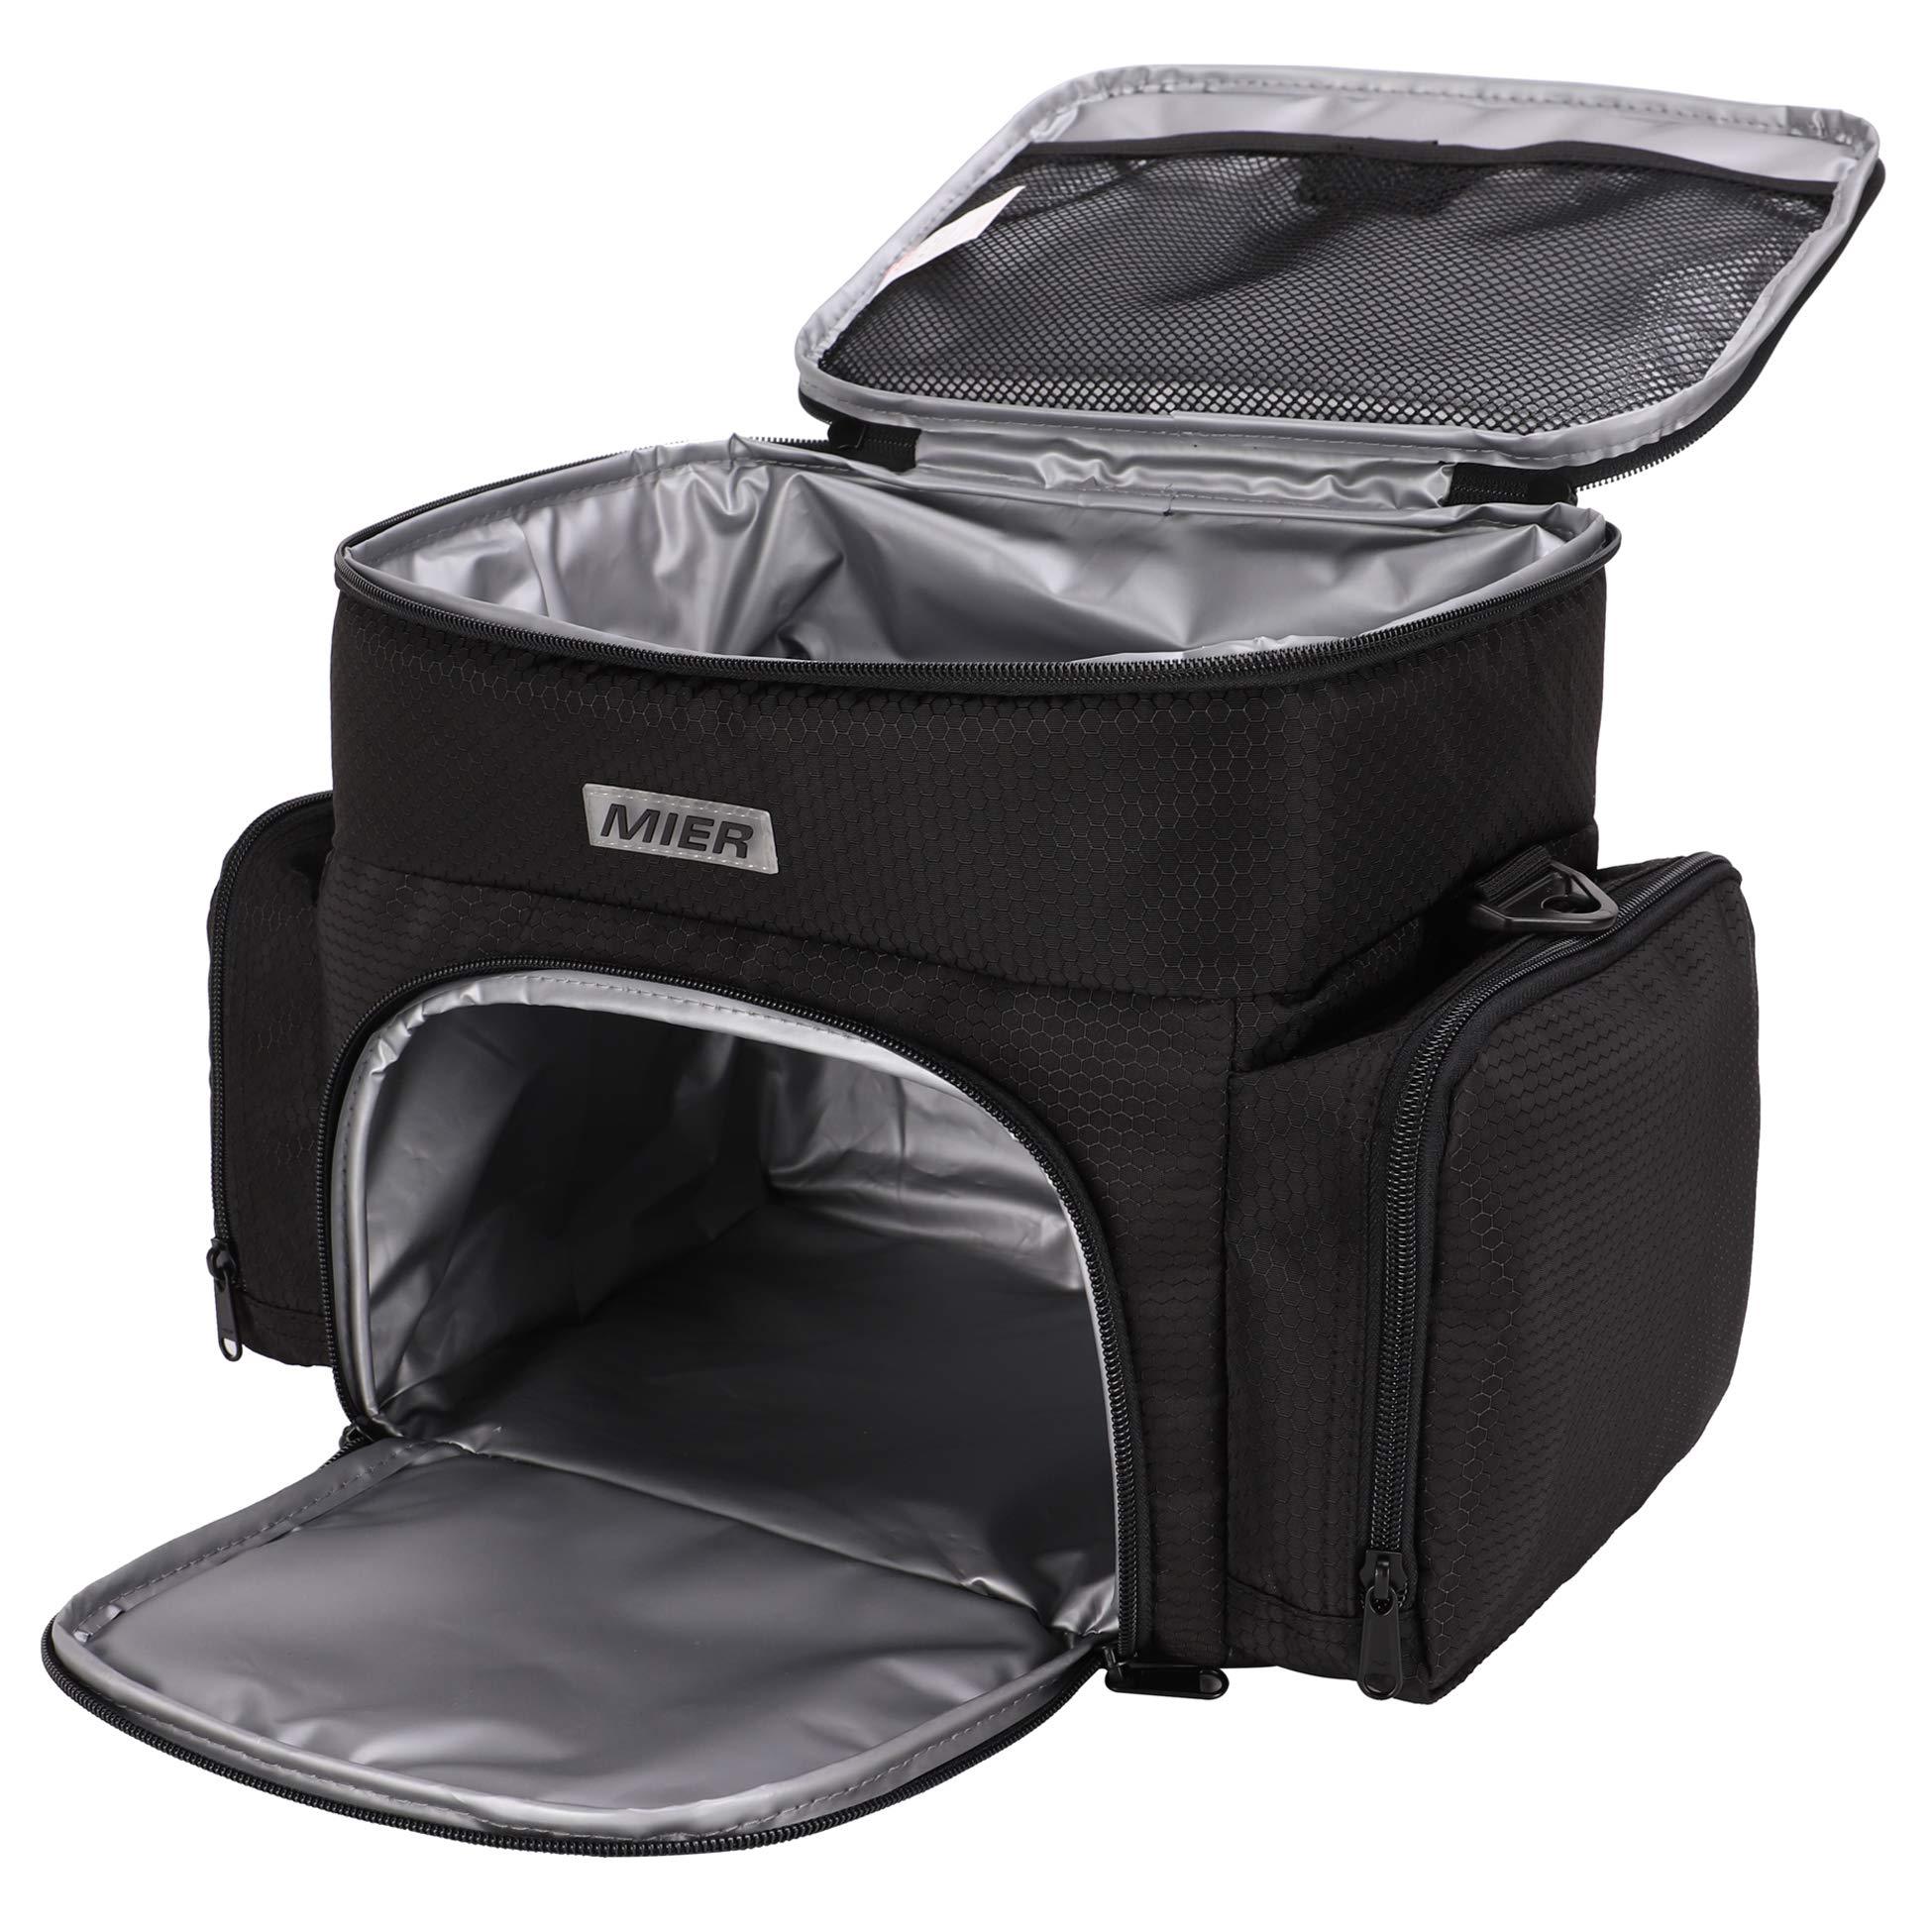 MIER 2 Compartment Lunch Bag Insulated Cooler Bag Meal Prep Bag for Men, Women, Adult, Black